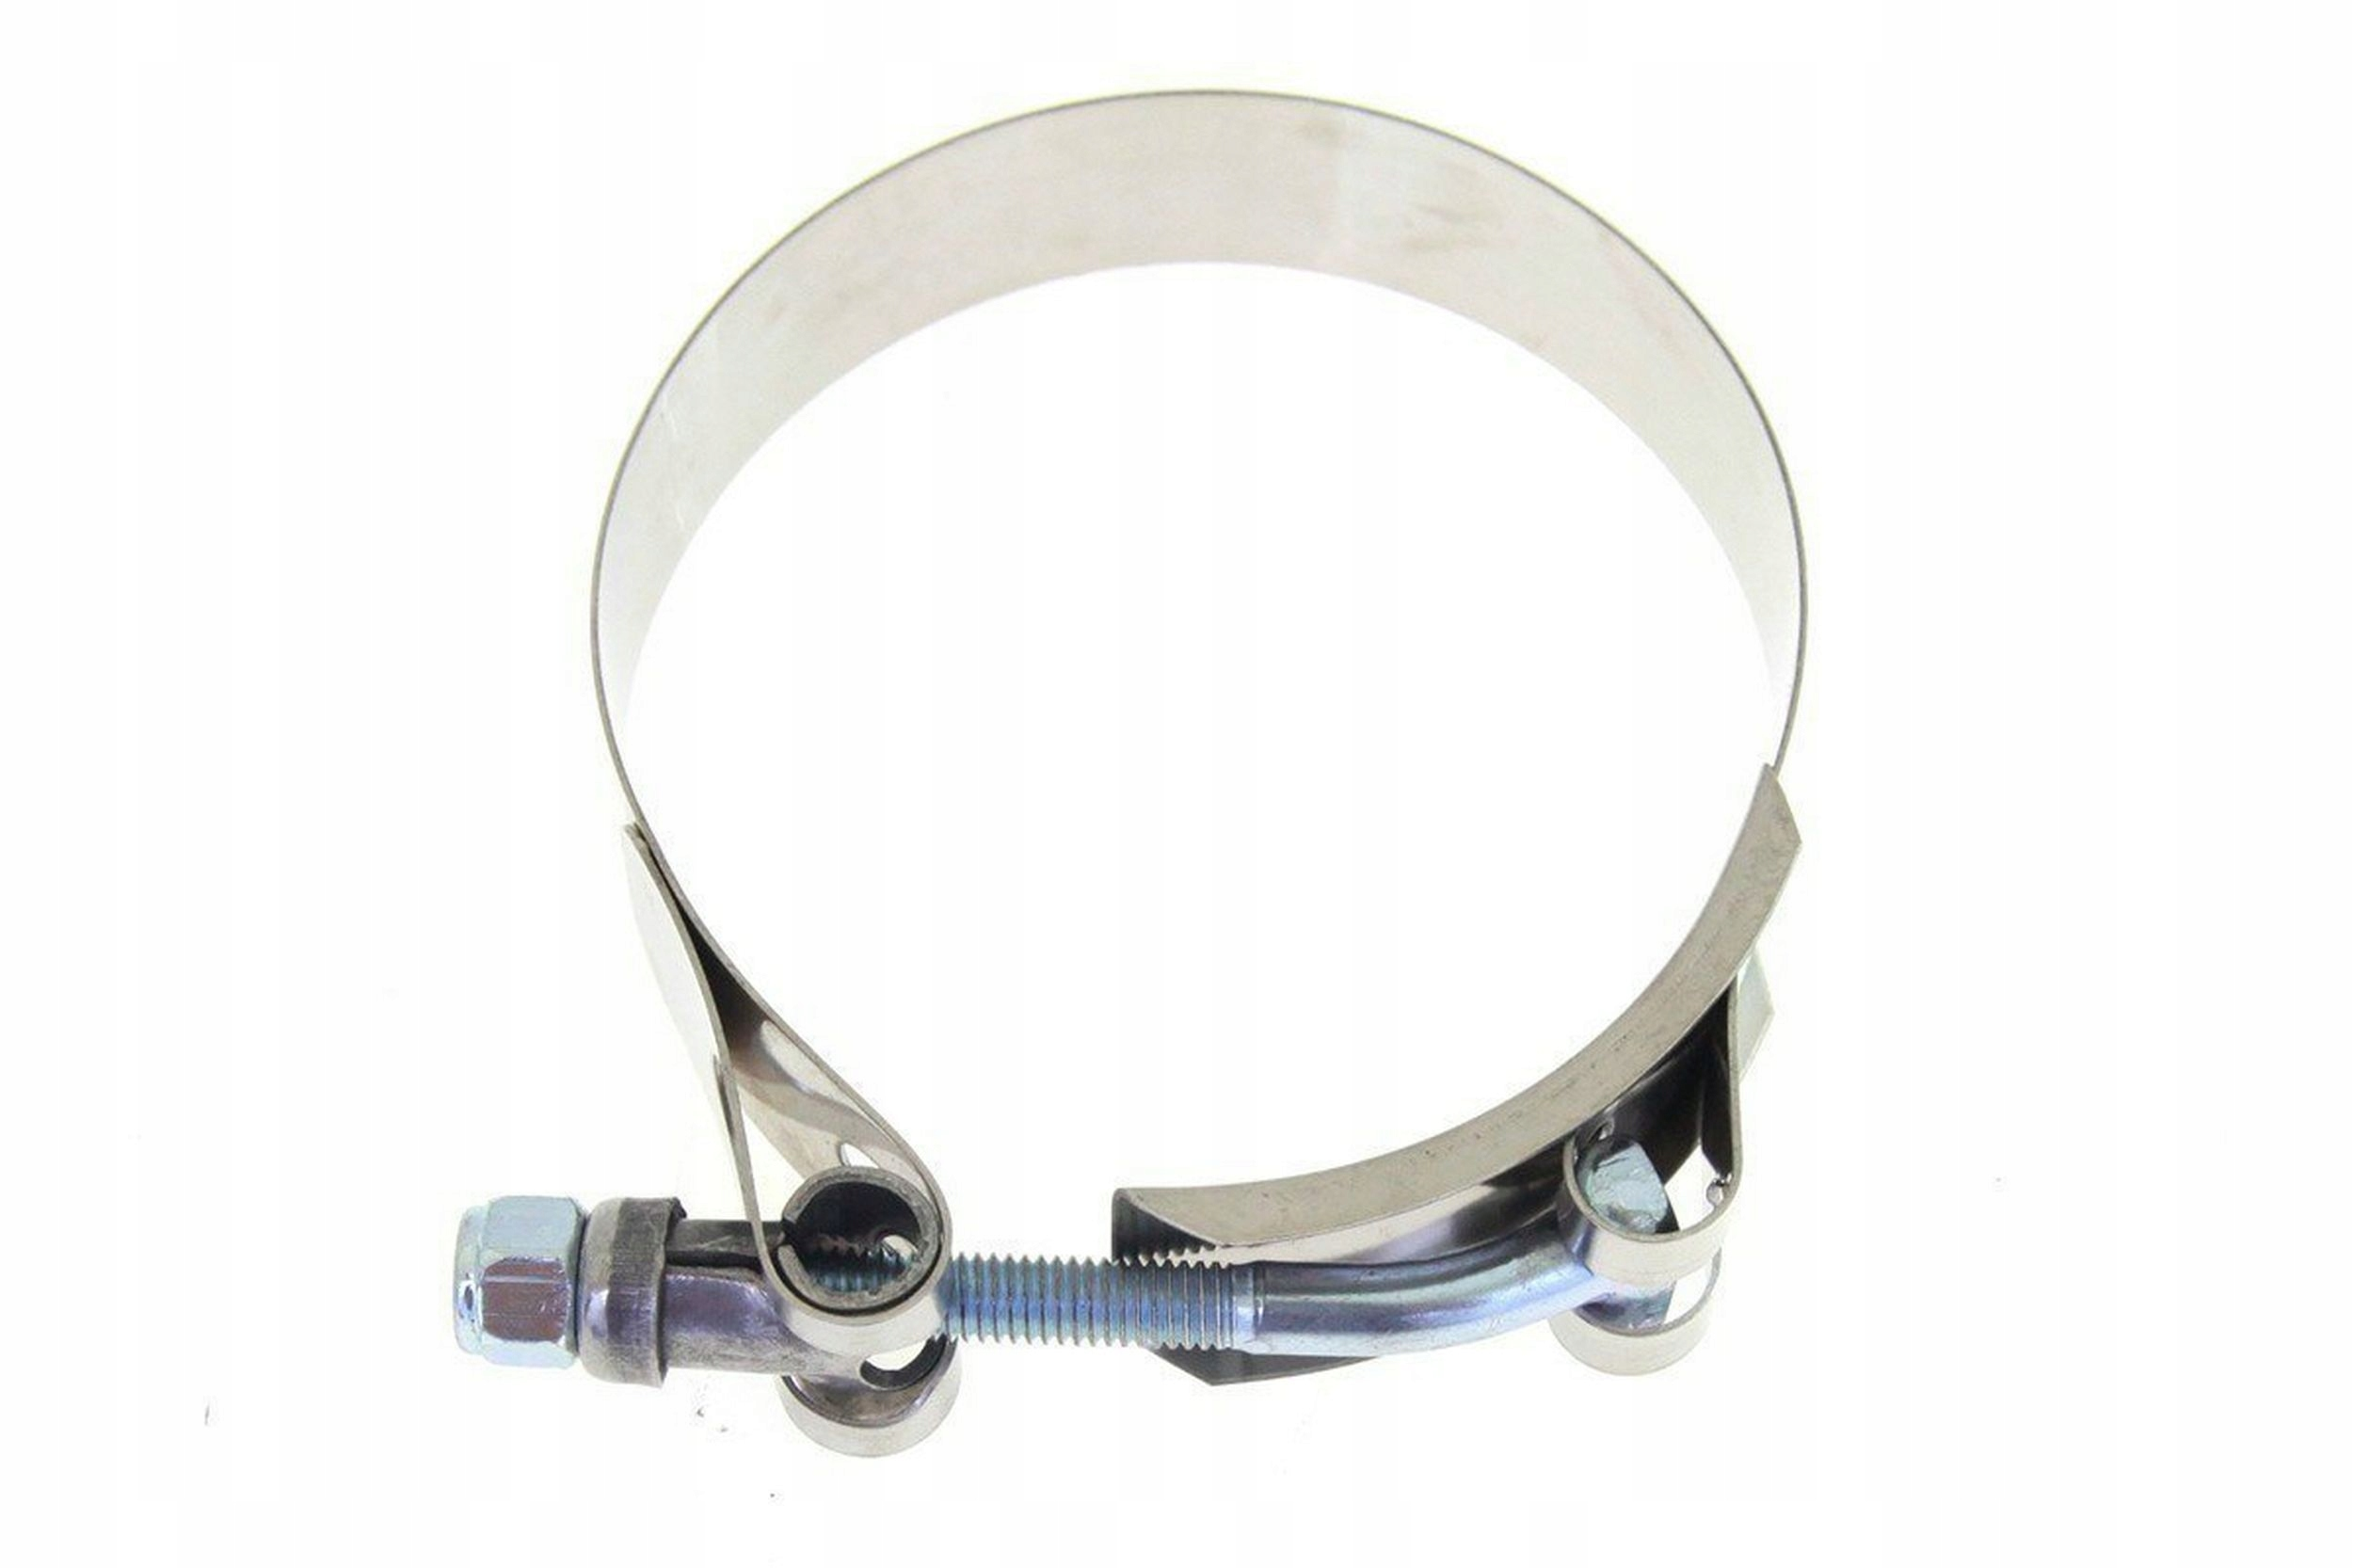 повязка колодка t-clamp 54-62 мм turboworks